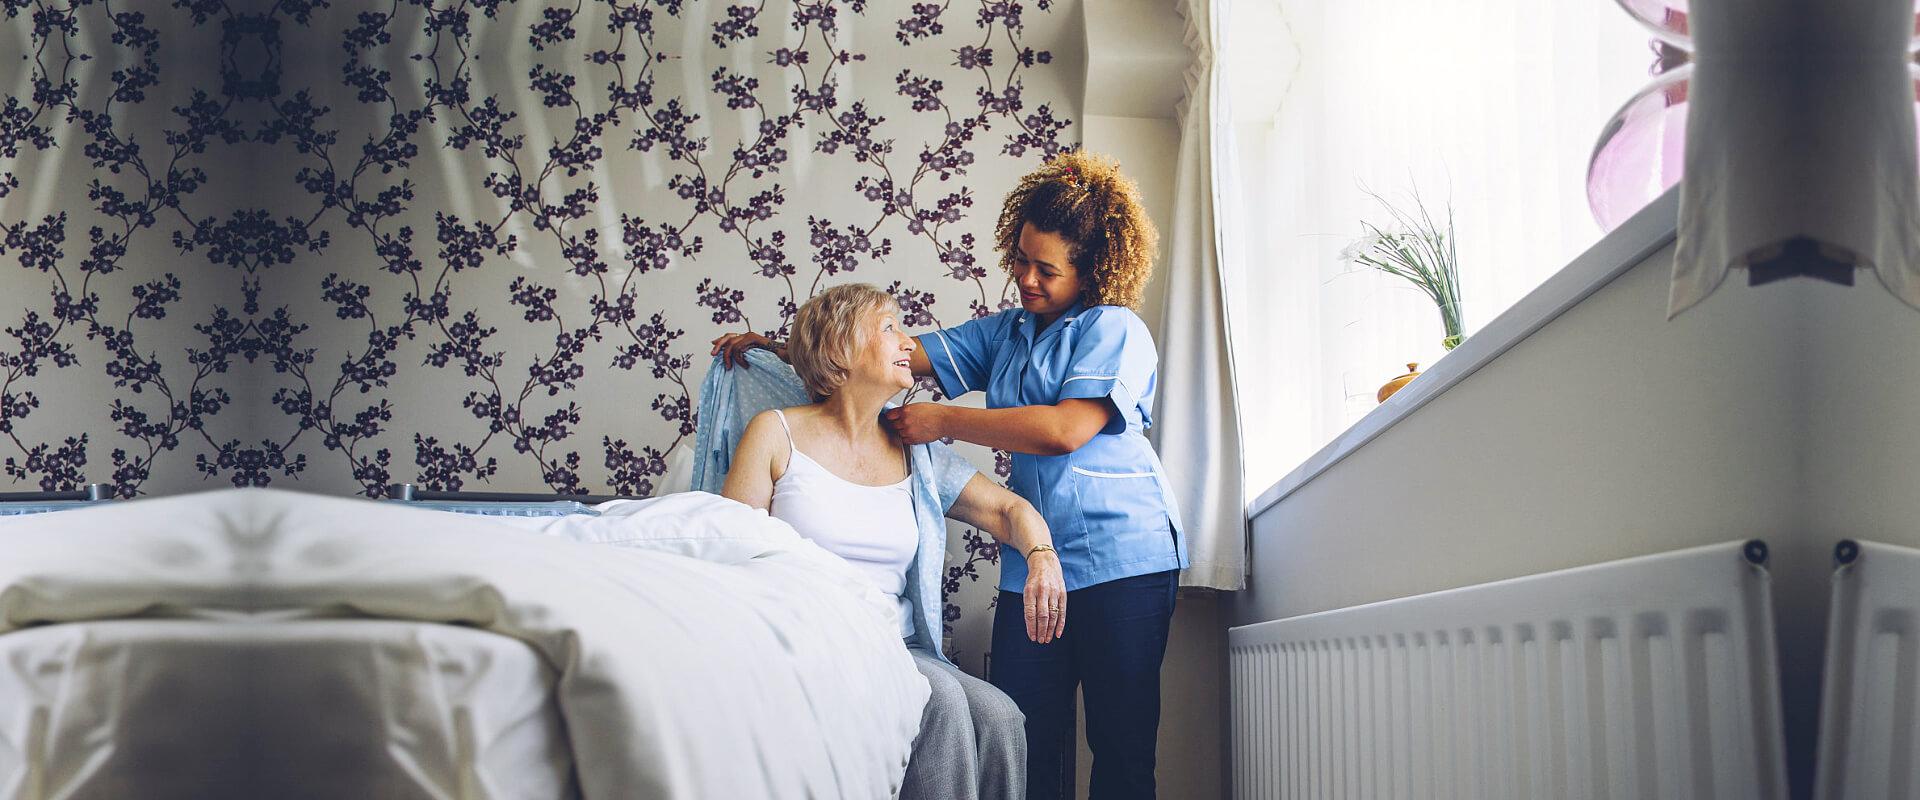 caregiver assisting senior woman get dressed